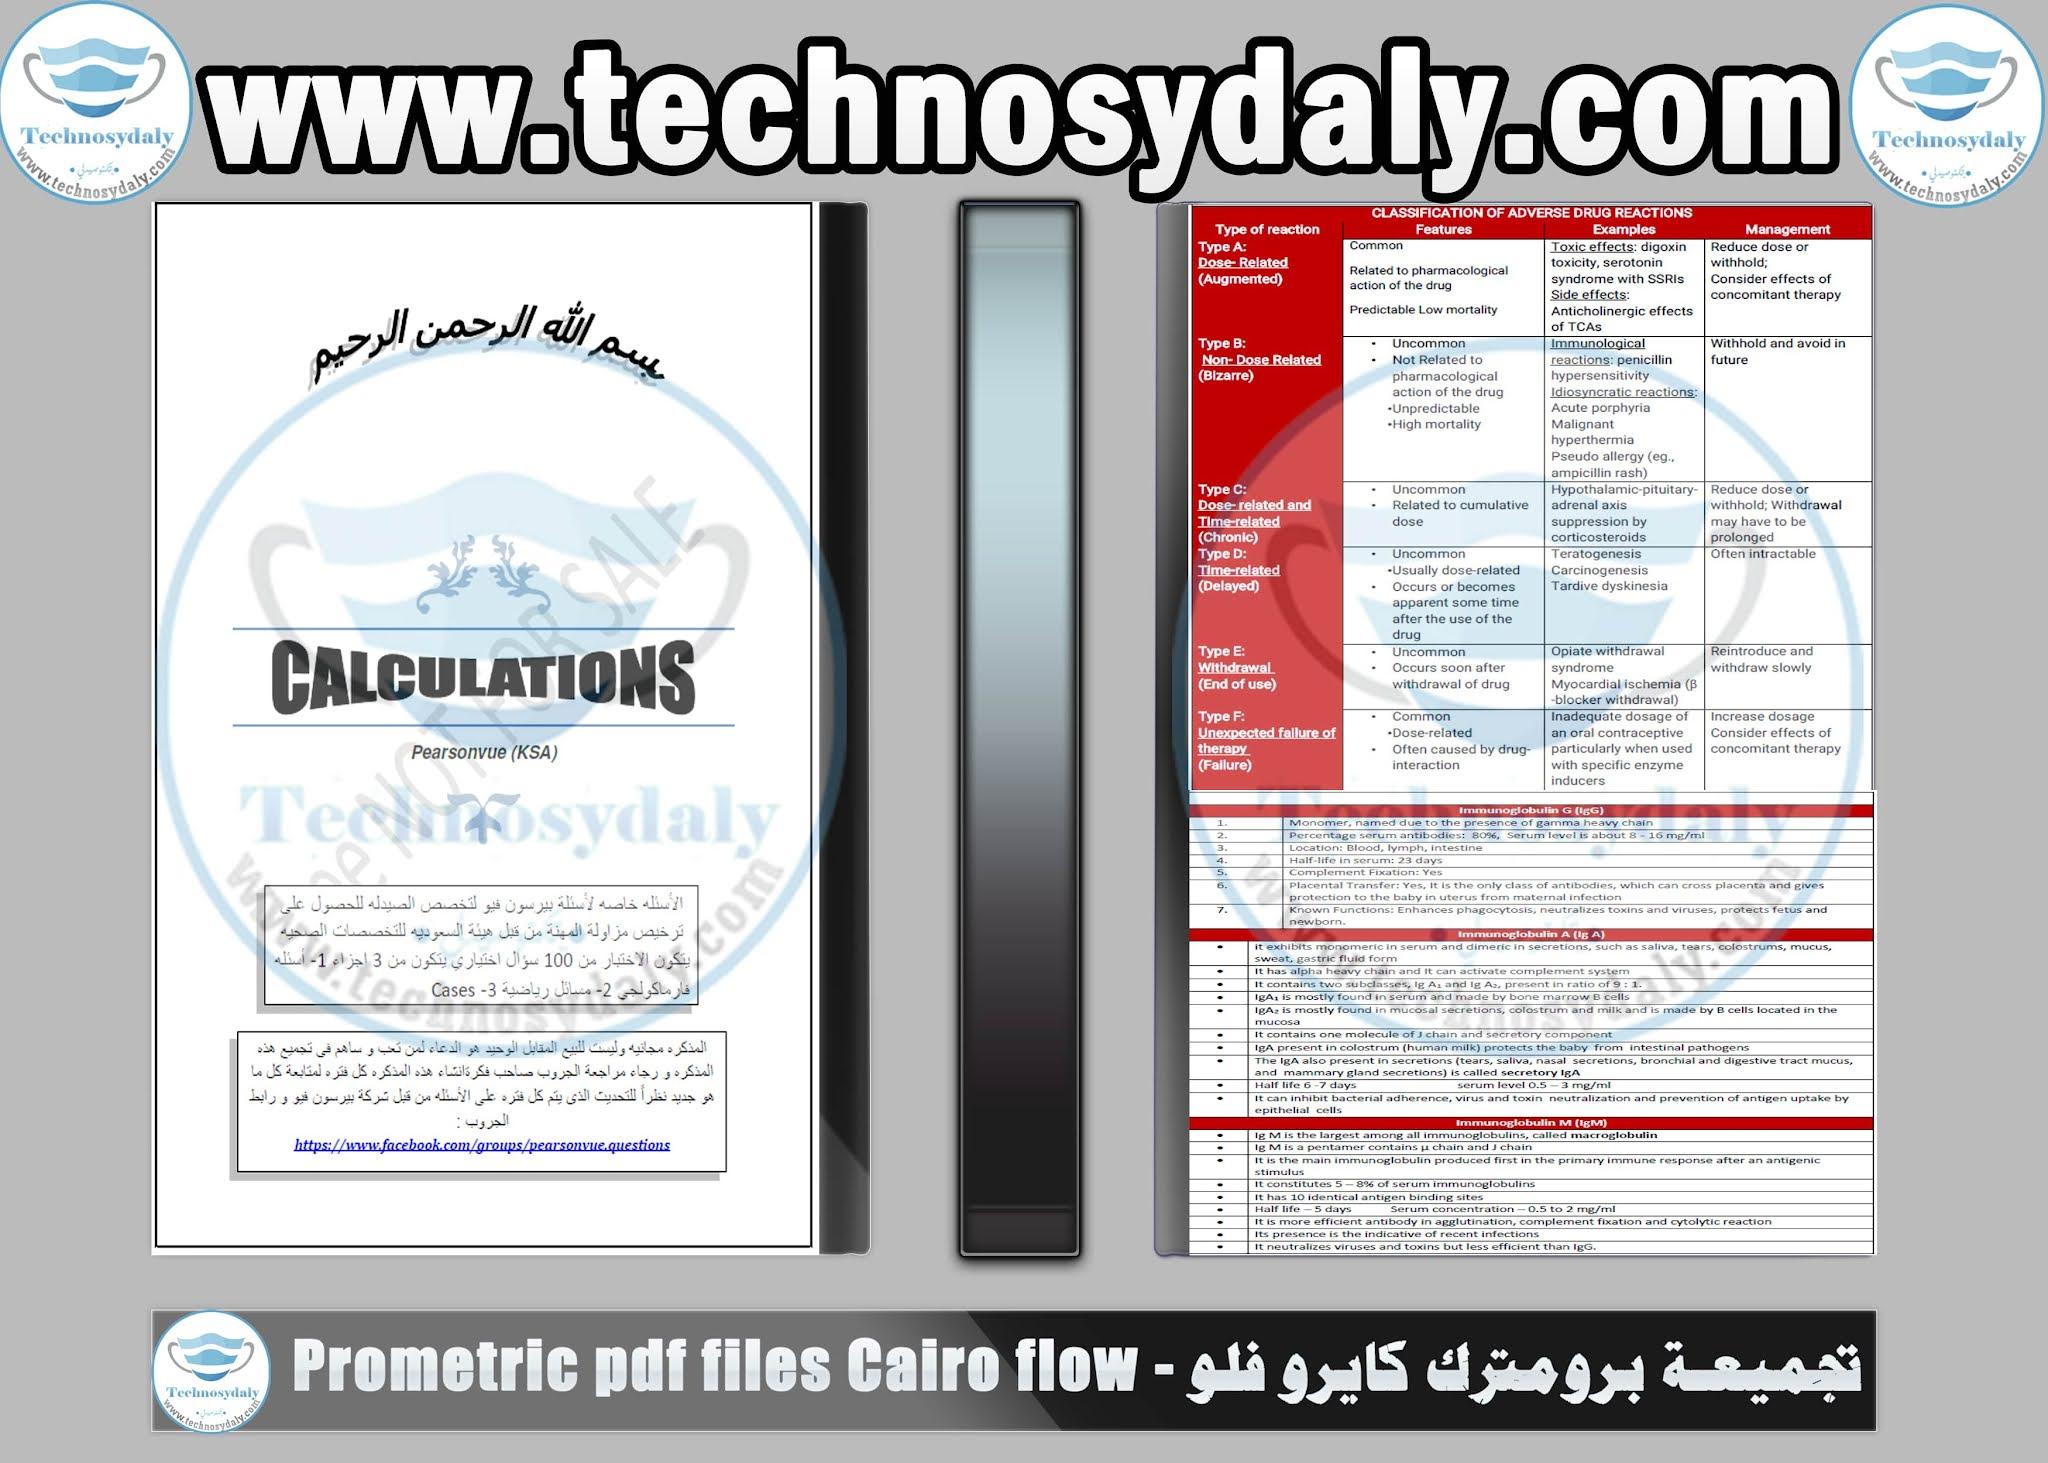 تجميعة برومترك كايرو فلو - Prometric pdf files Cairo flow